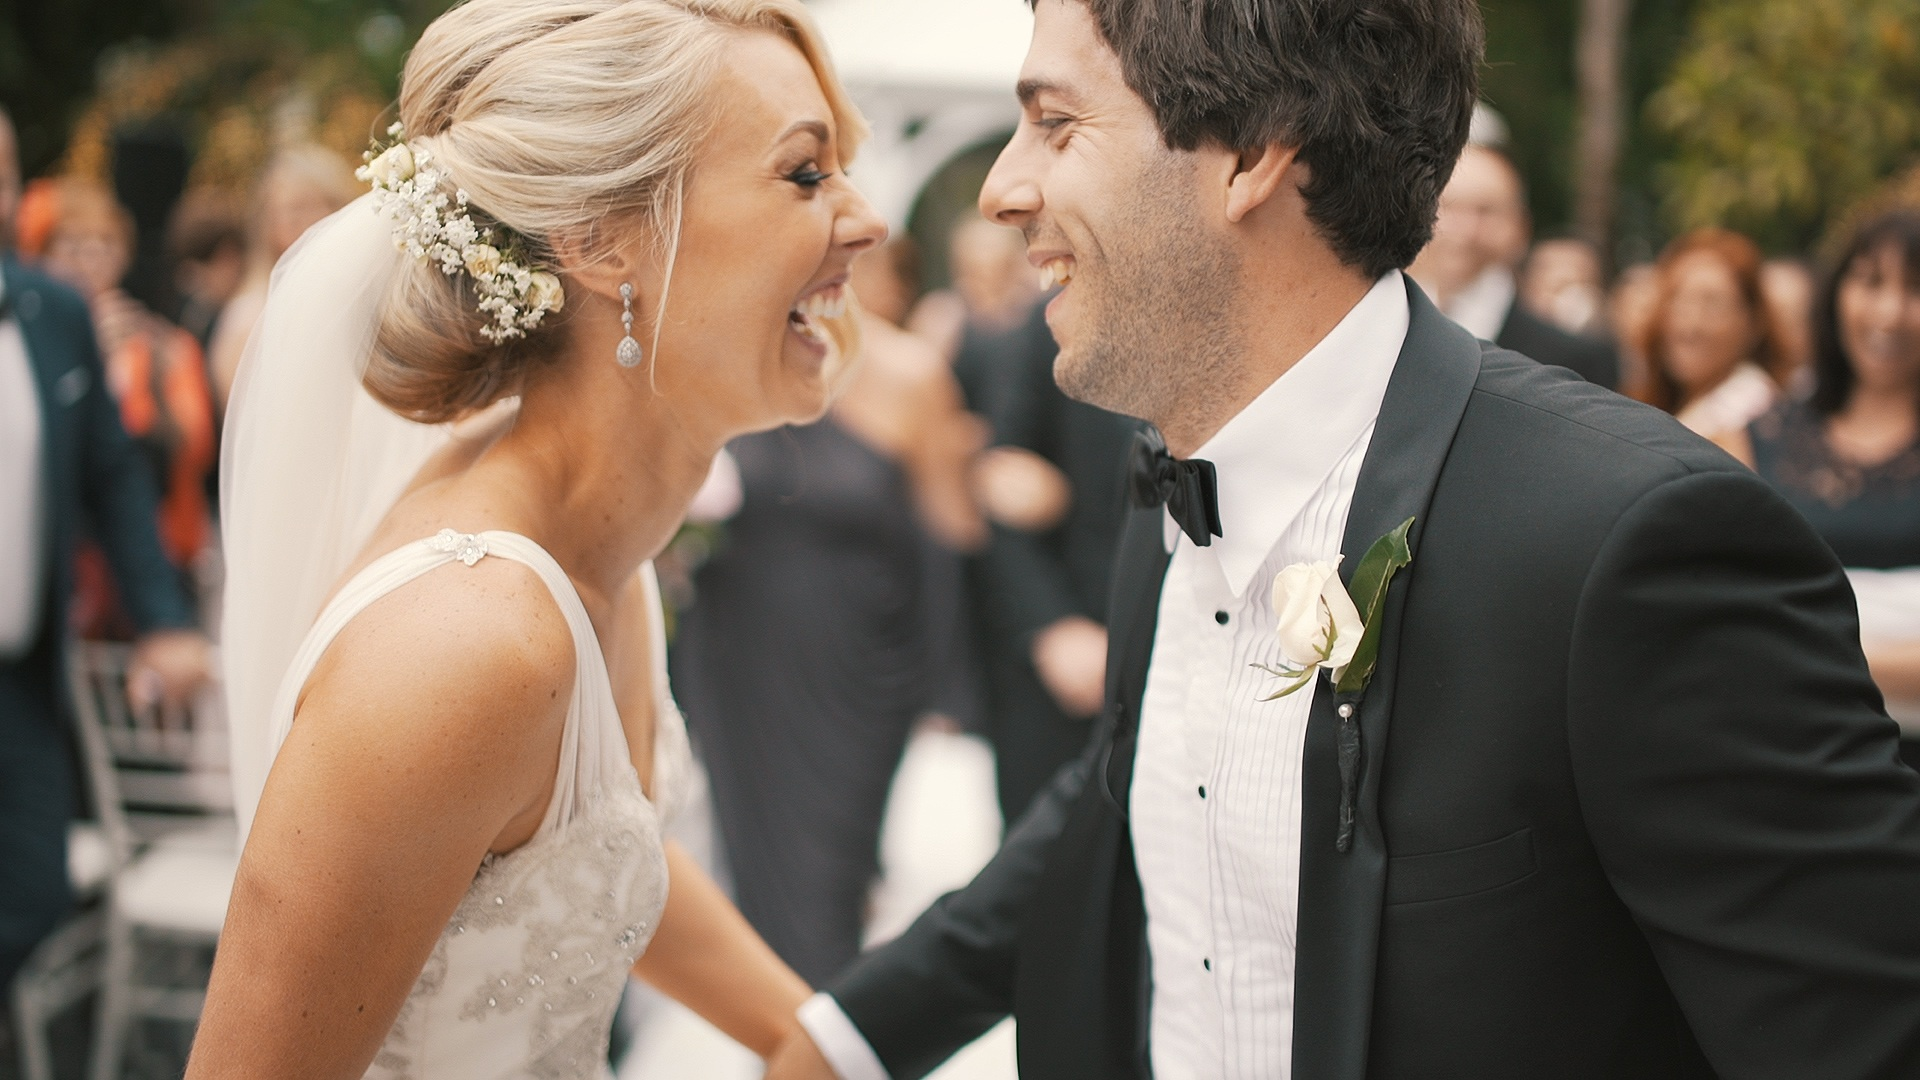 LA-Signature-Wedding-Planning.jpg